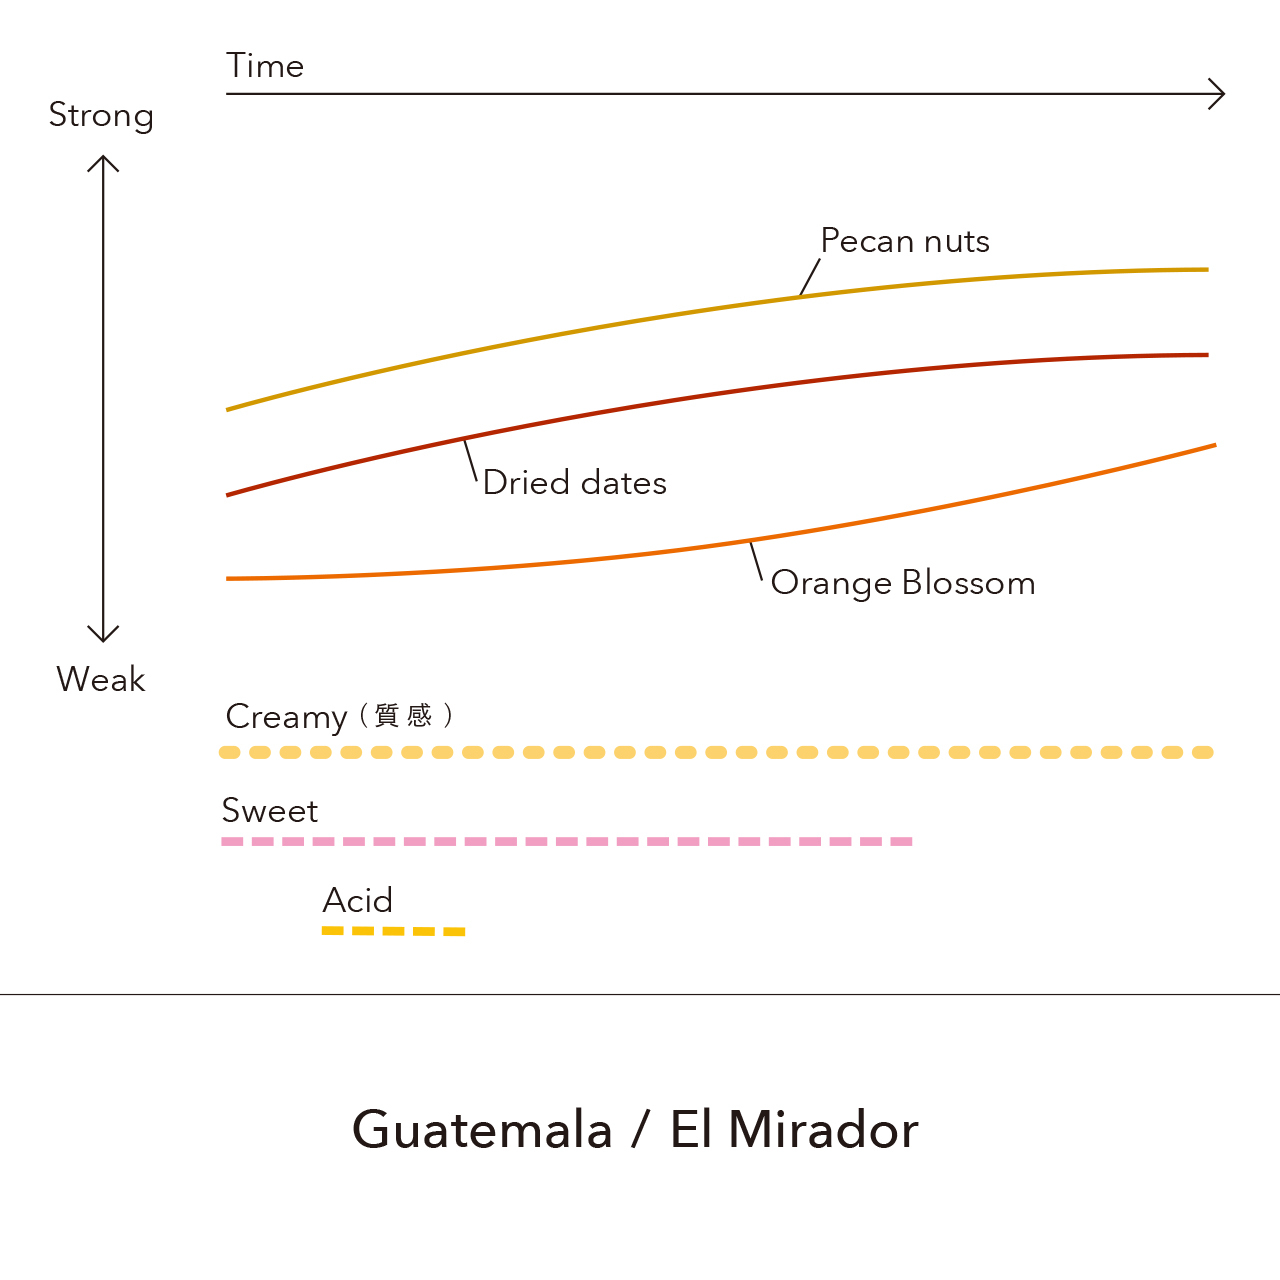 Guatemala - El Mirador / 150g